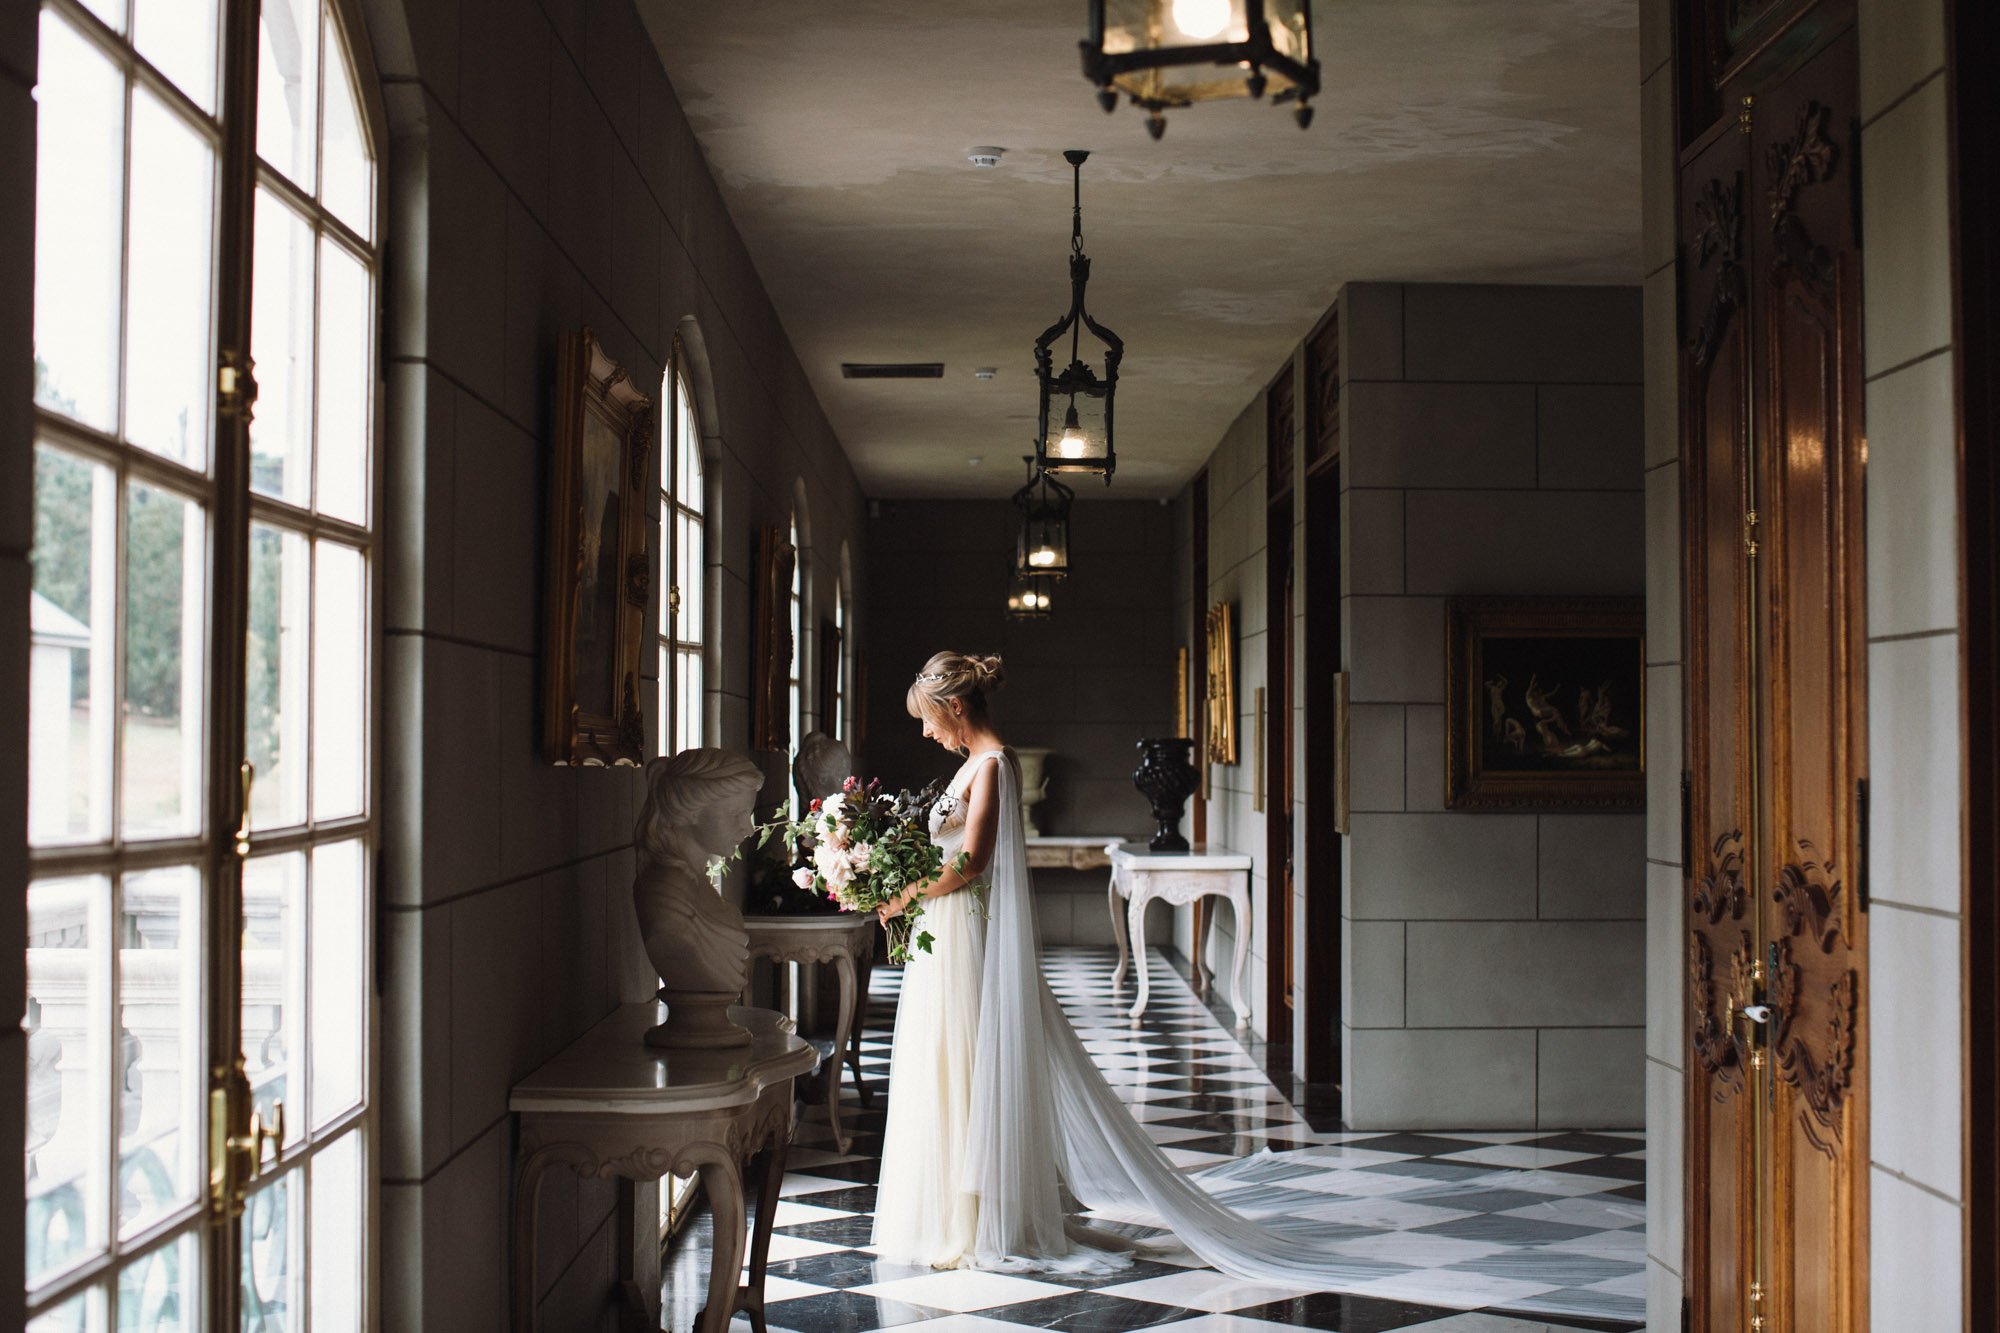 Campbell Point House Wedding HJ + Dean Raphael Weddings-60.jpg